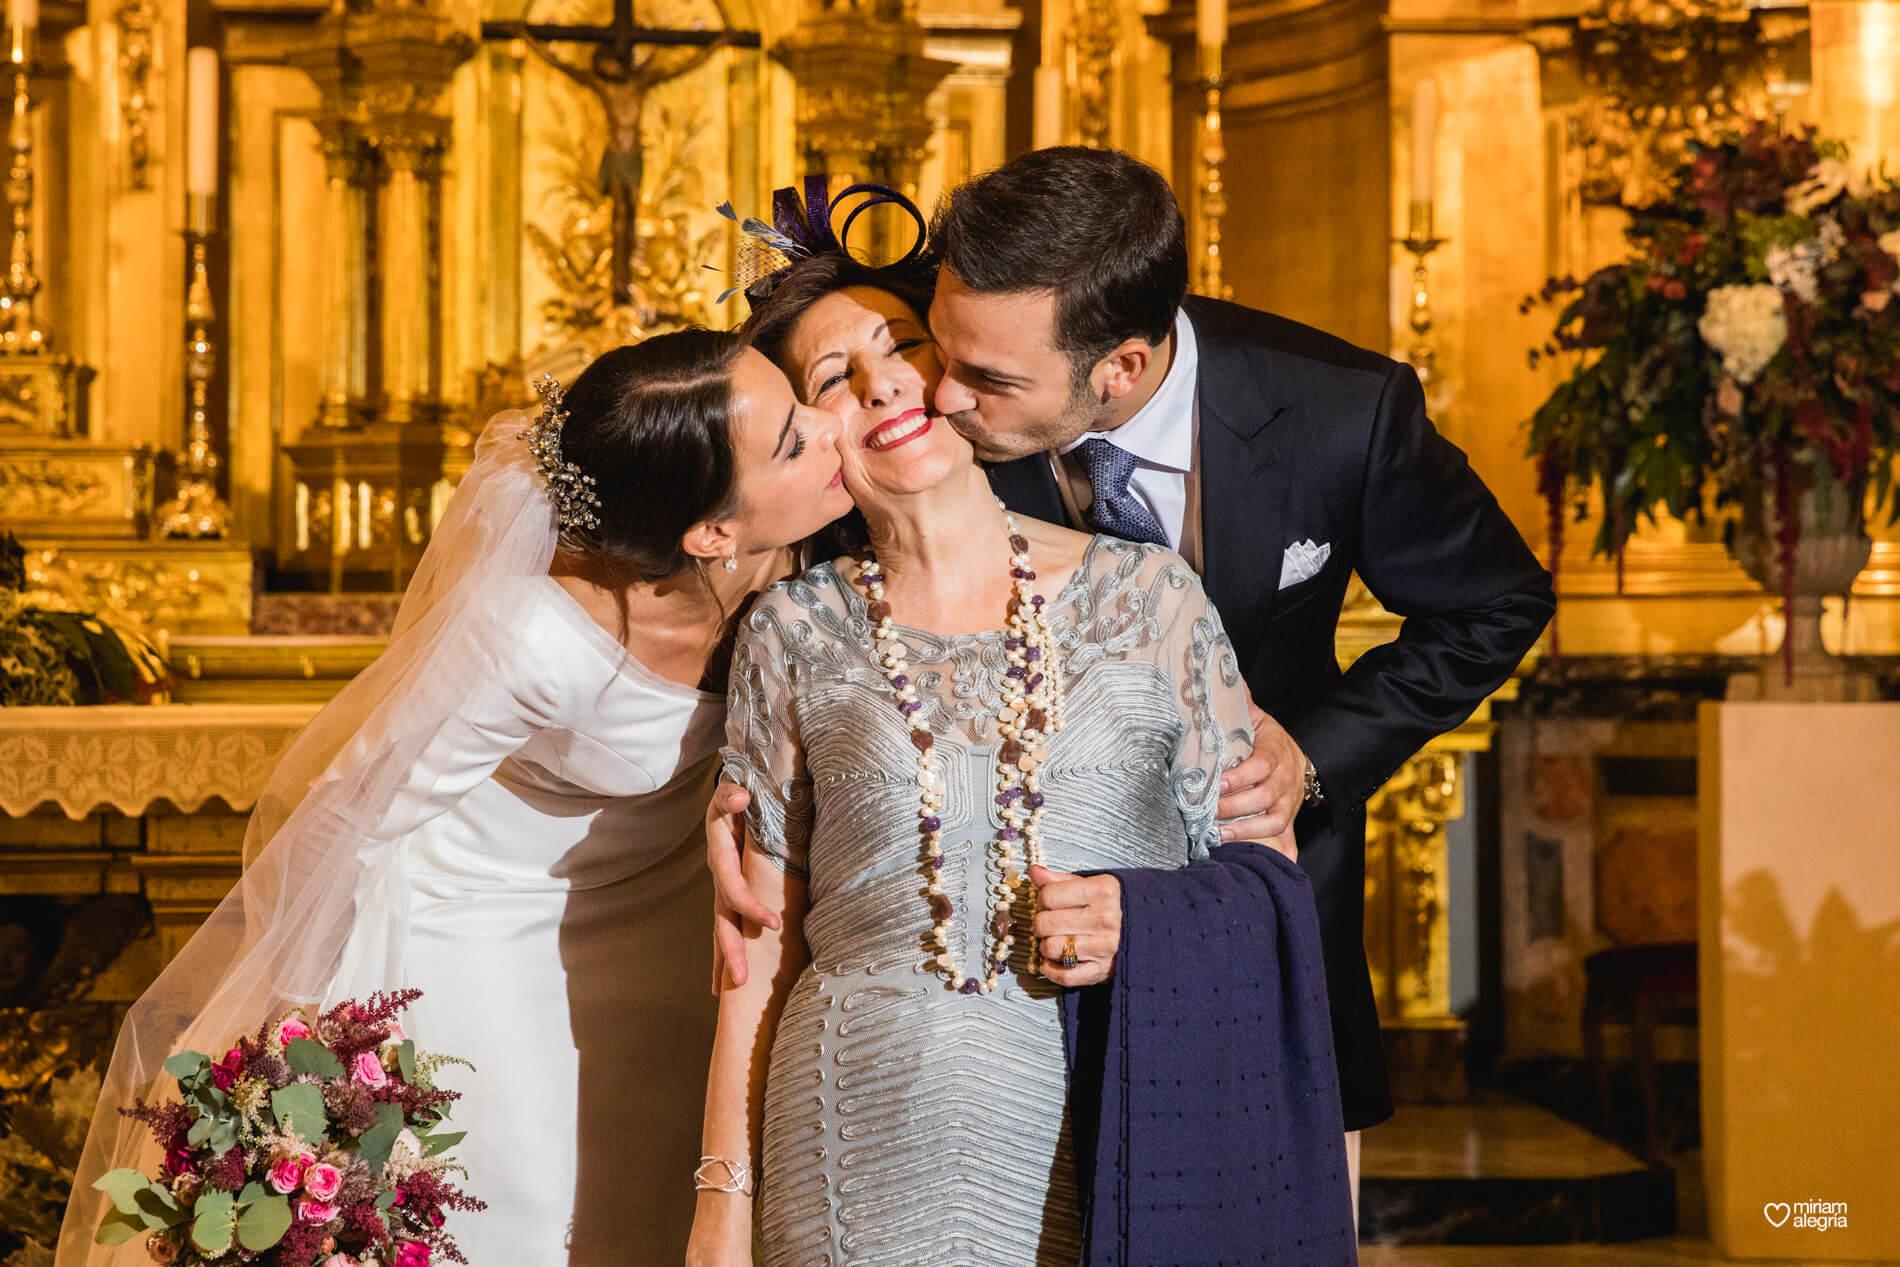 vestido-de-novia-paula-del-vas-miriam-alegria-fotografos-boda-murcia-74